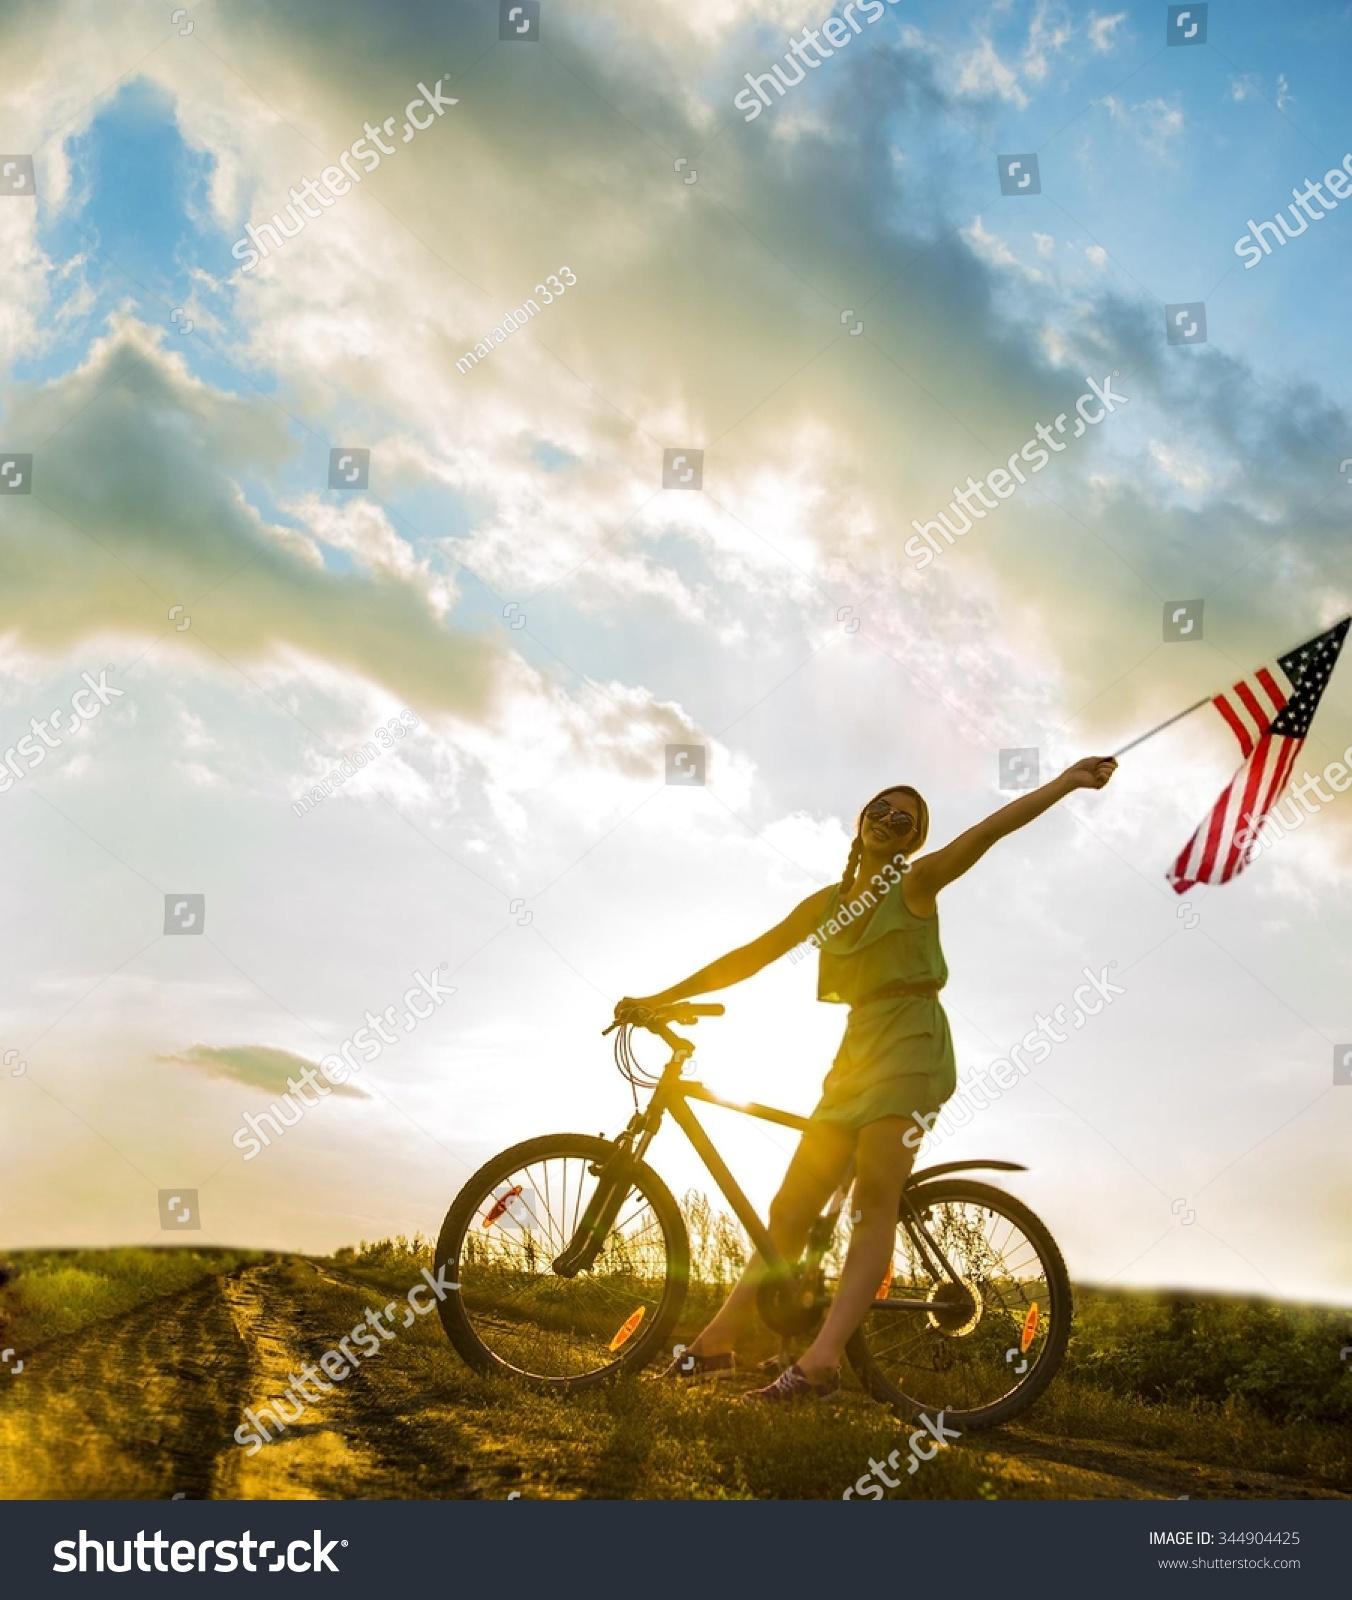 Royalty Free Symbol Of Celebration 4 Fourth Of July 344904425